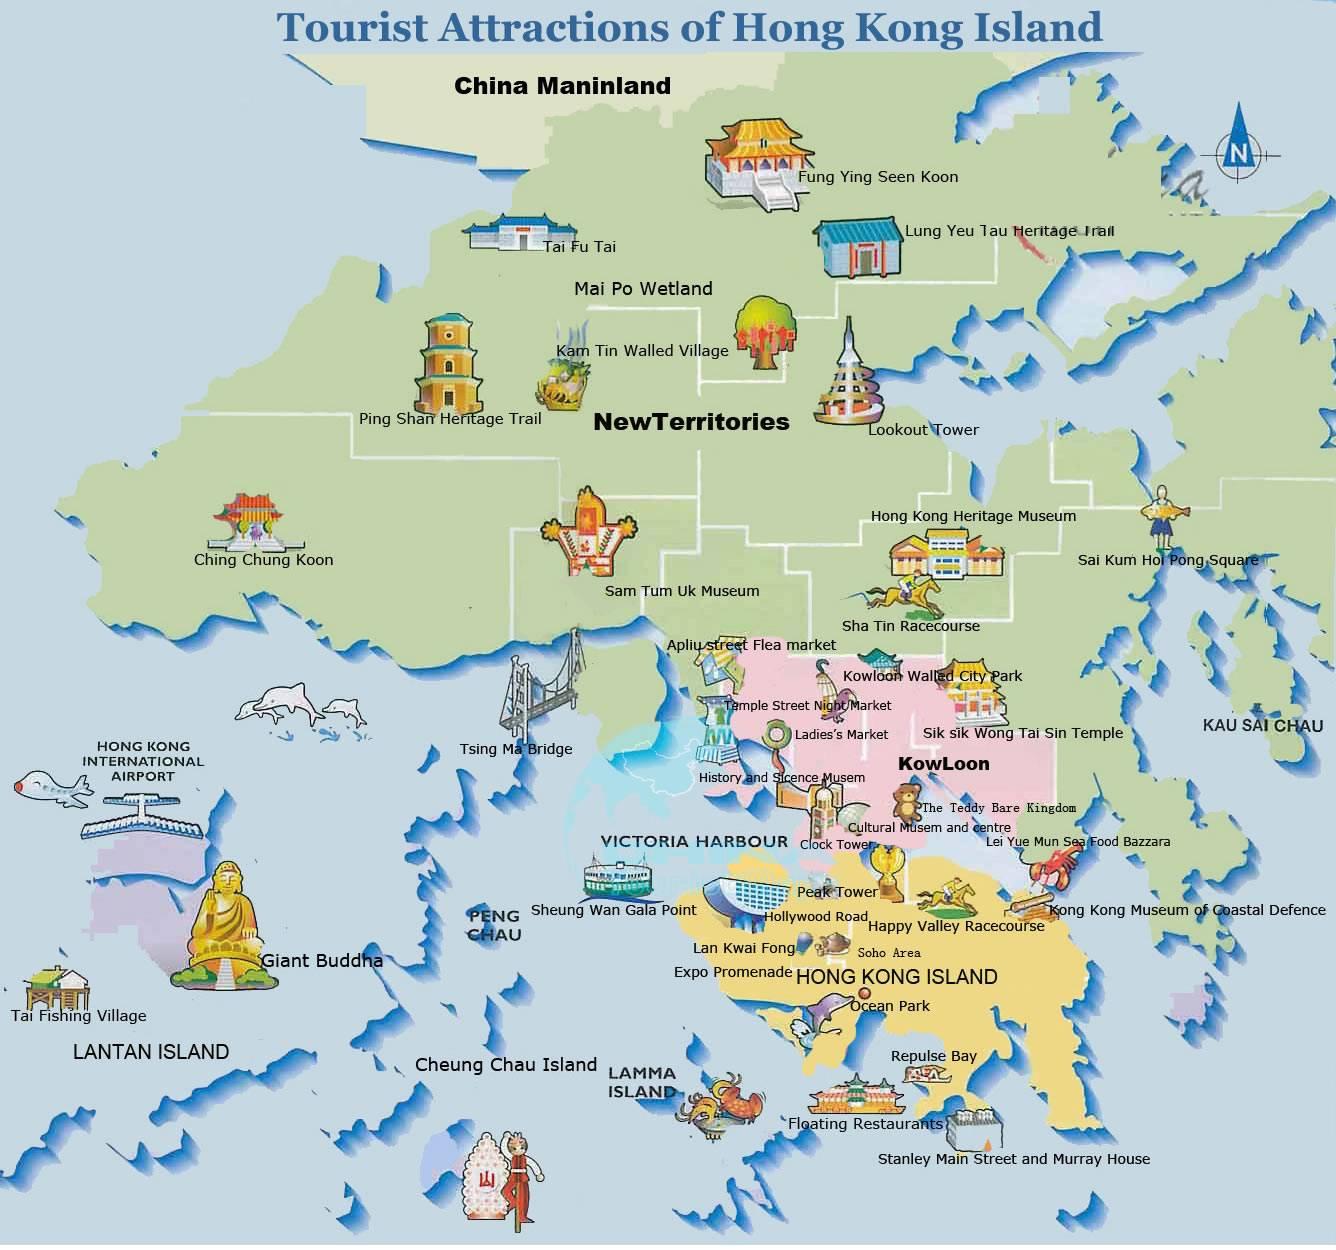 Kaarten van Hong Kong   Gedetailleerde gedrukte plattegronden van Hong Kong- OrangeSmile.com